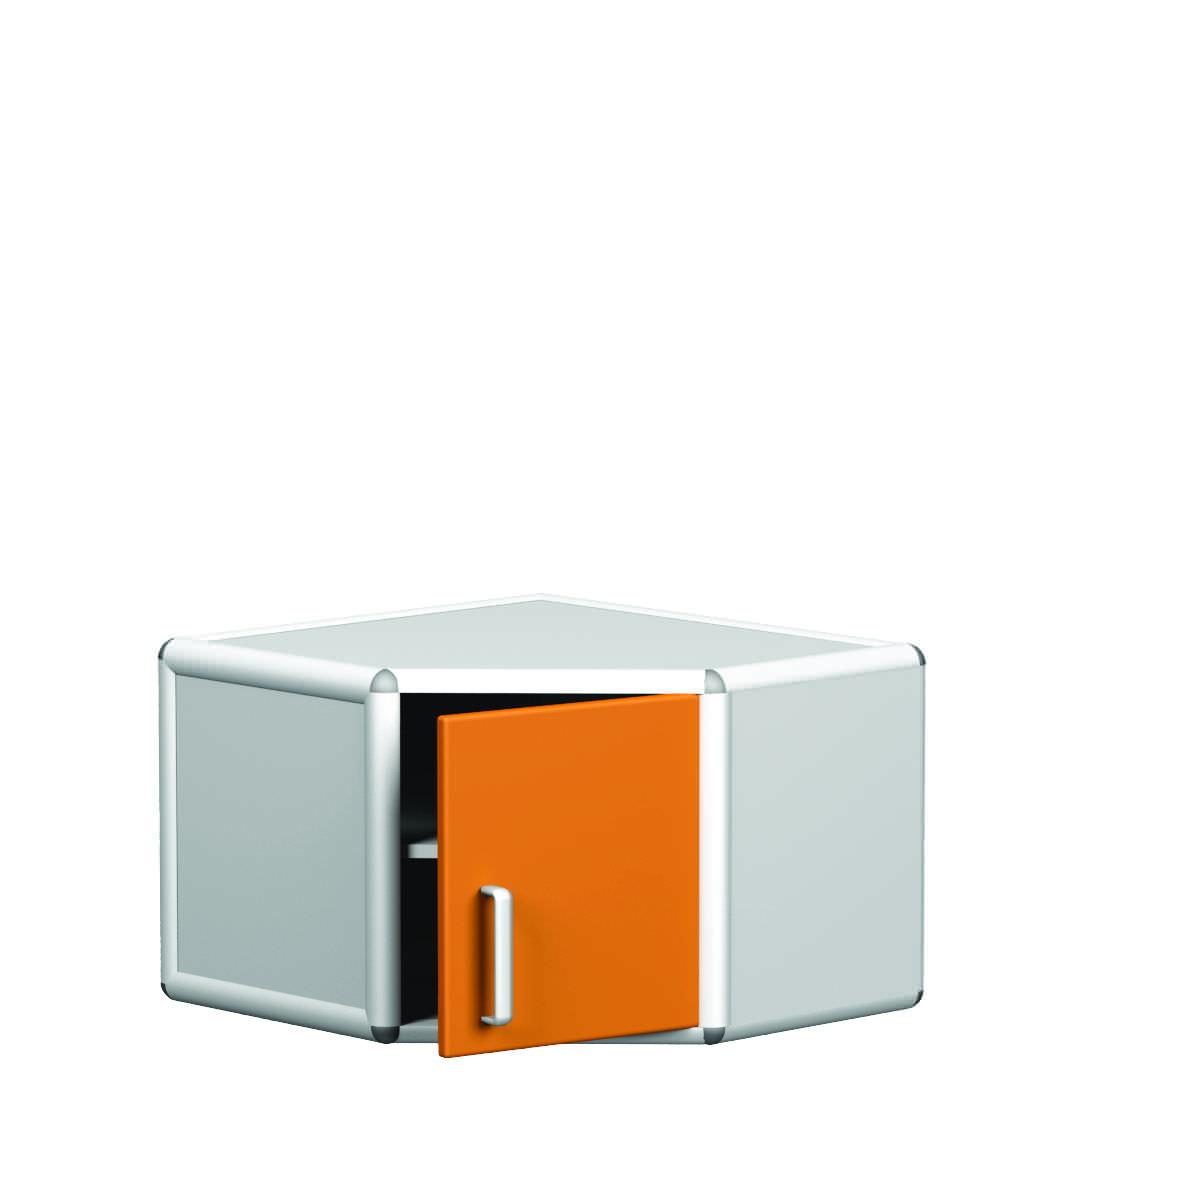 Шкаф навесной ДМ-2-002-06